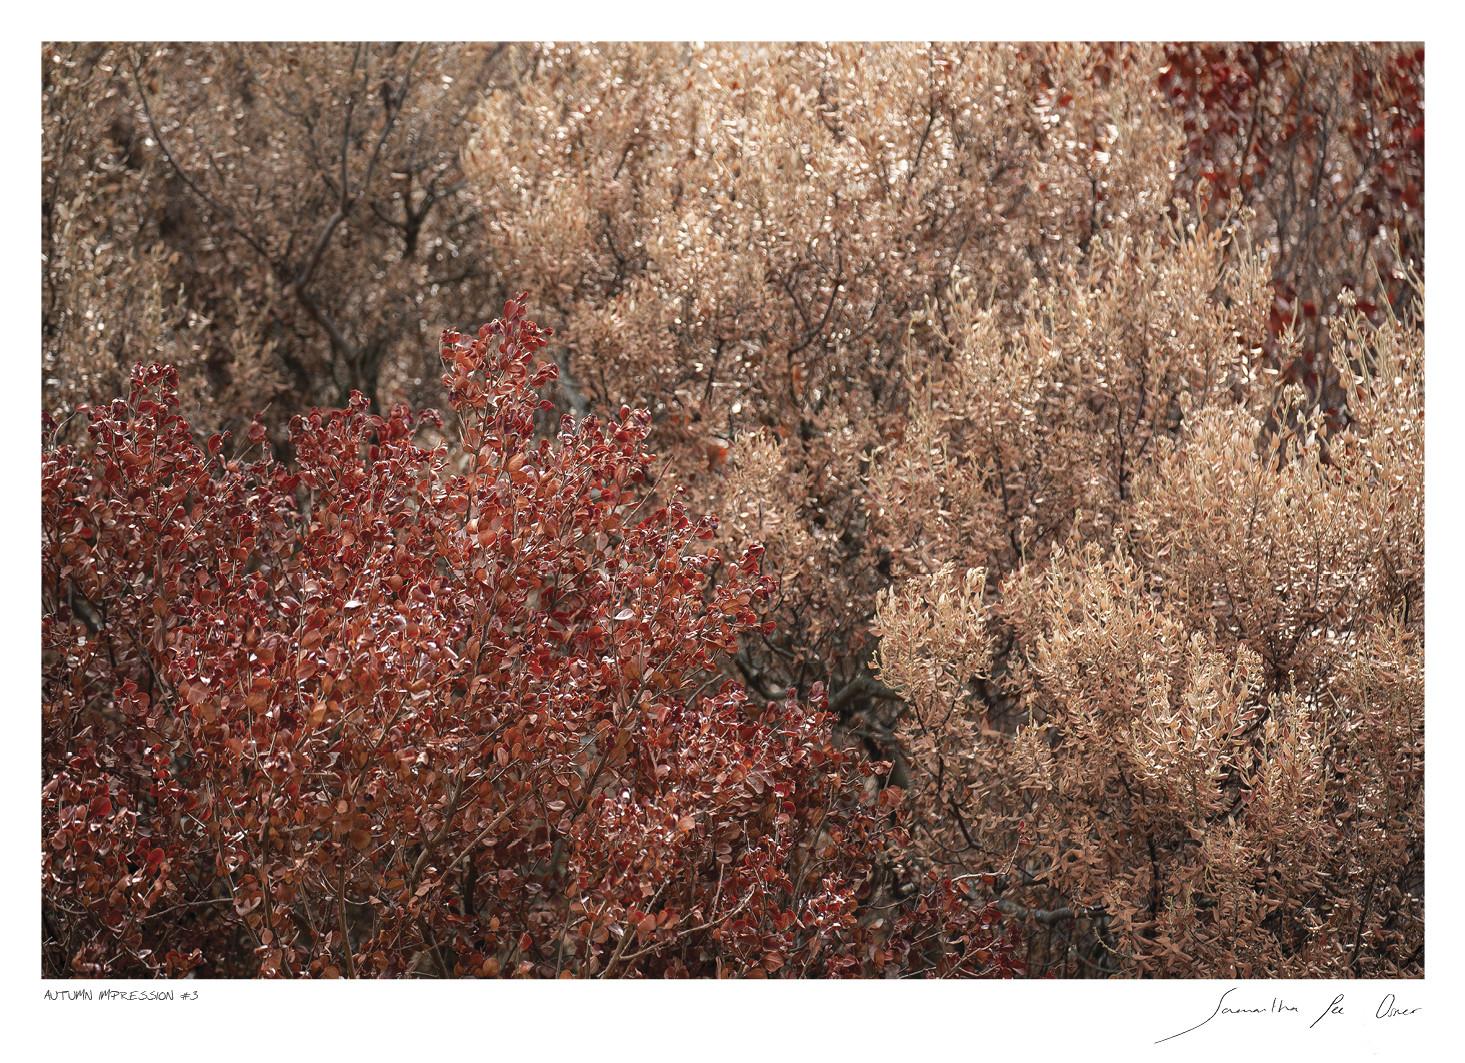 Autumn Impression No.3 | Samantha Lee Osner